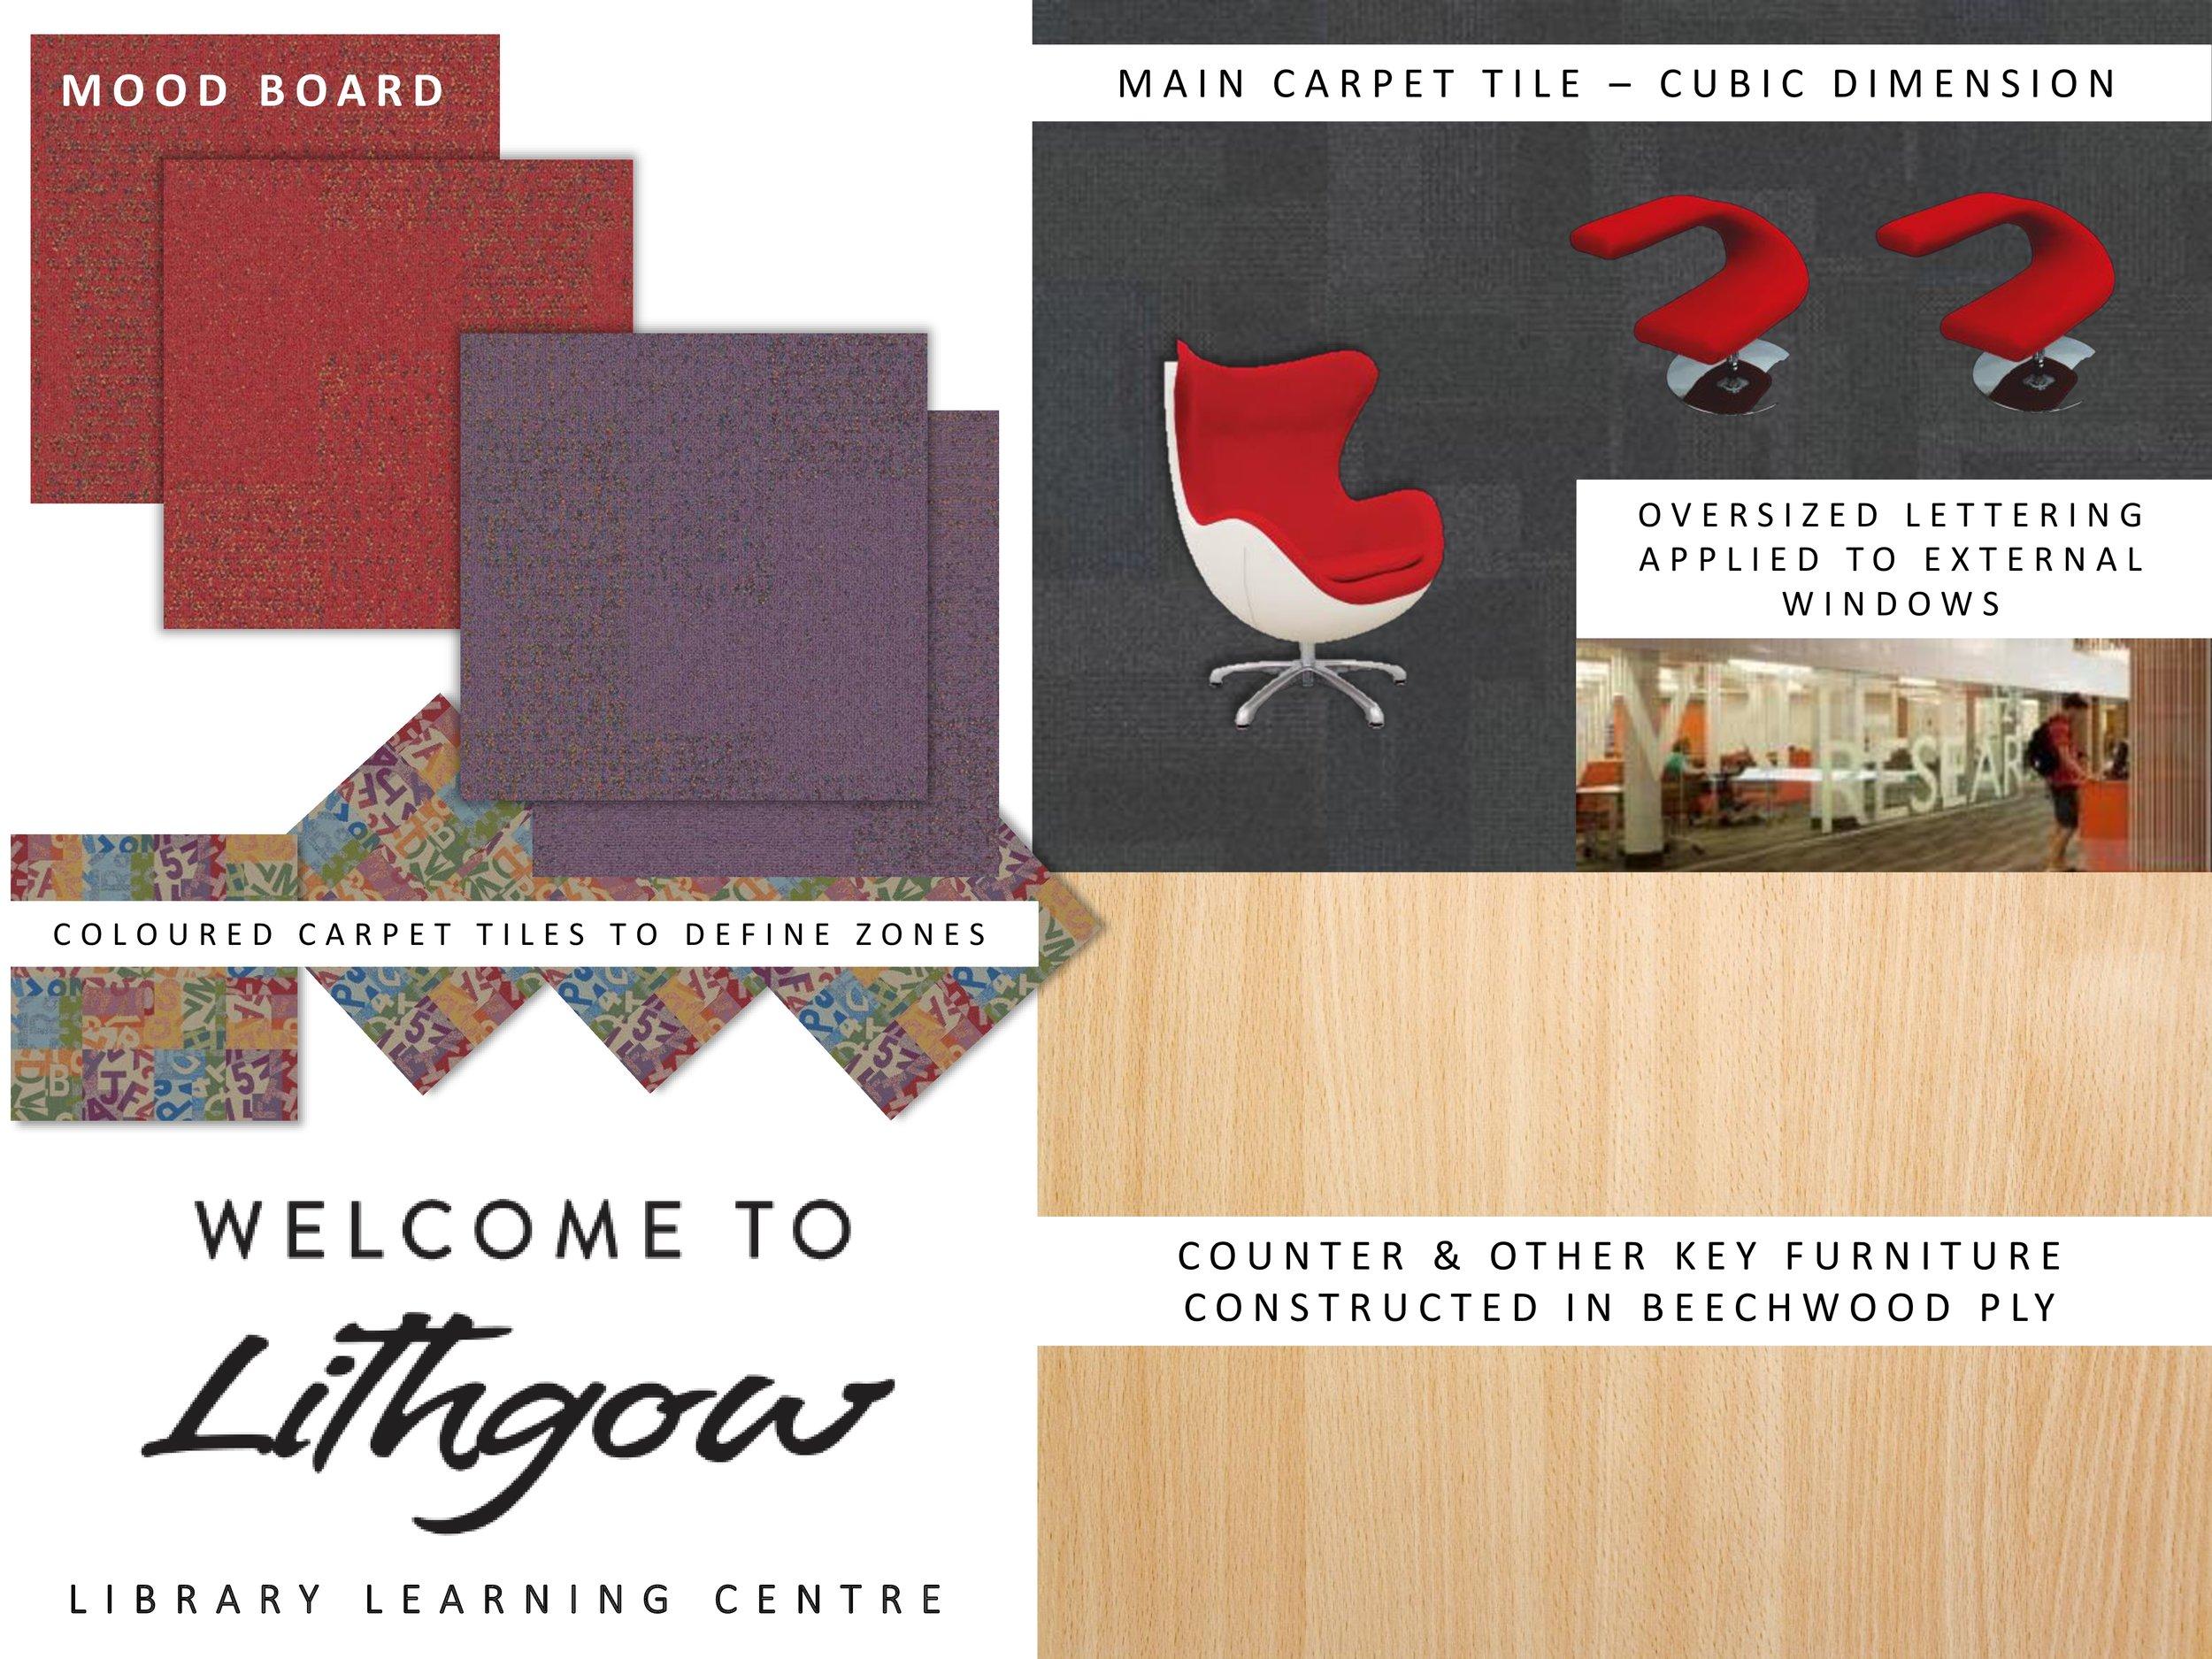 Lithgow Lib - Mood Board.jpg